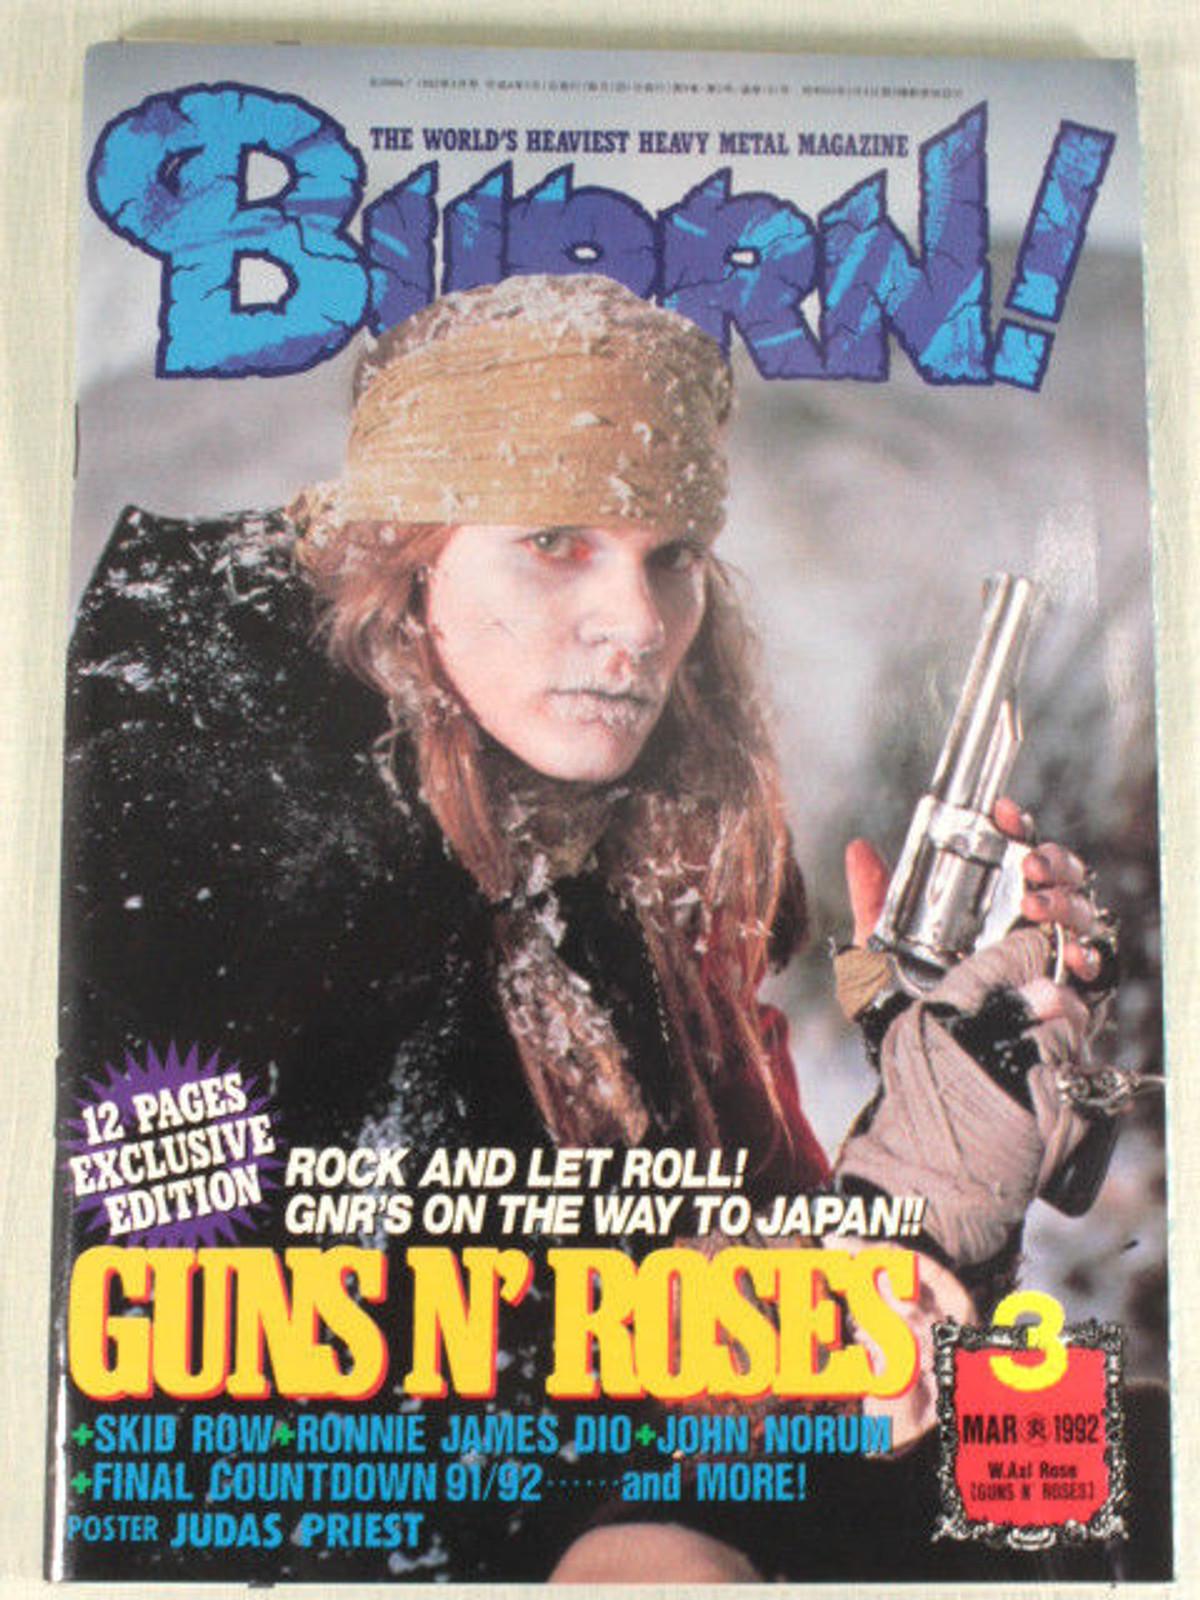 1992/03 BURRN! Japan Rock Magazine GUNS N' ROSES/SKID ROW/EUROPE/JOHN NORUM